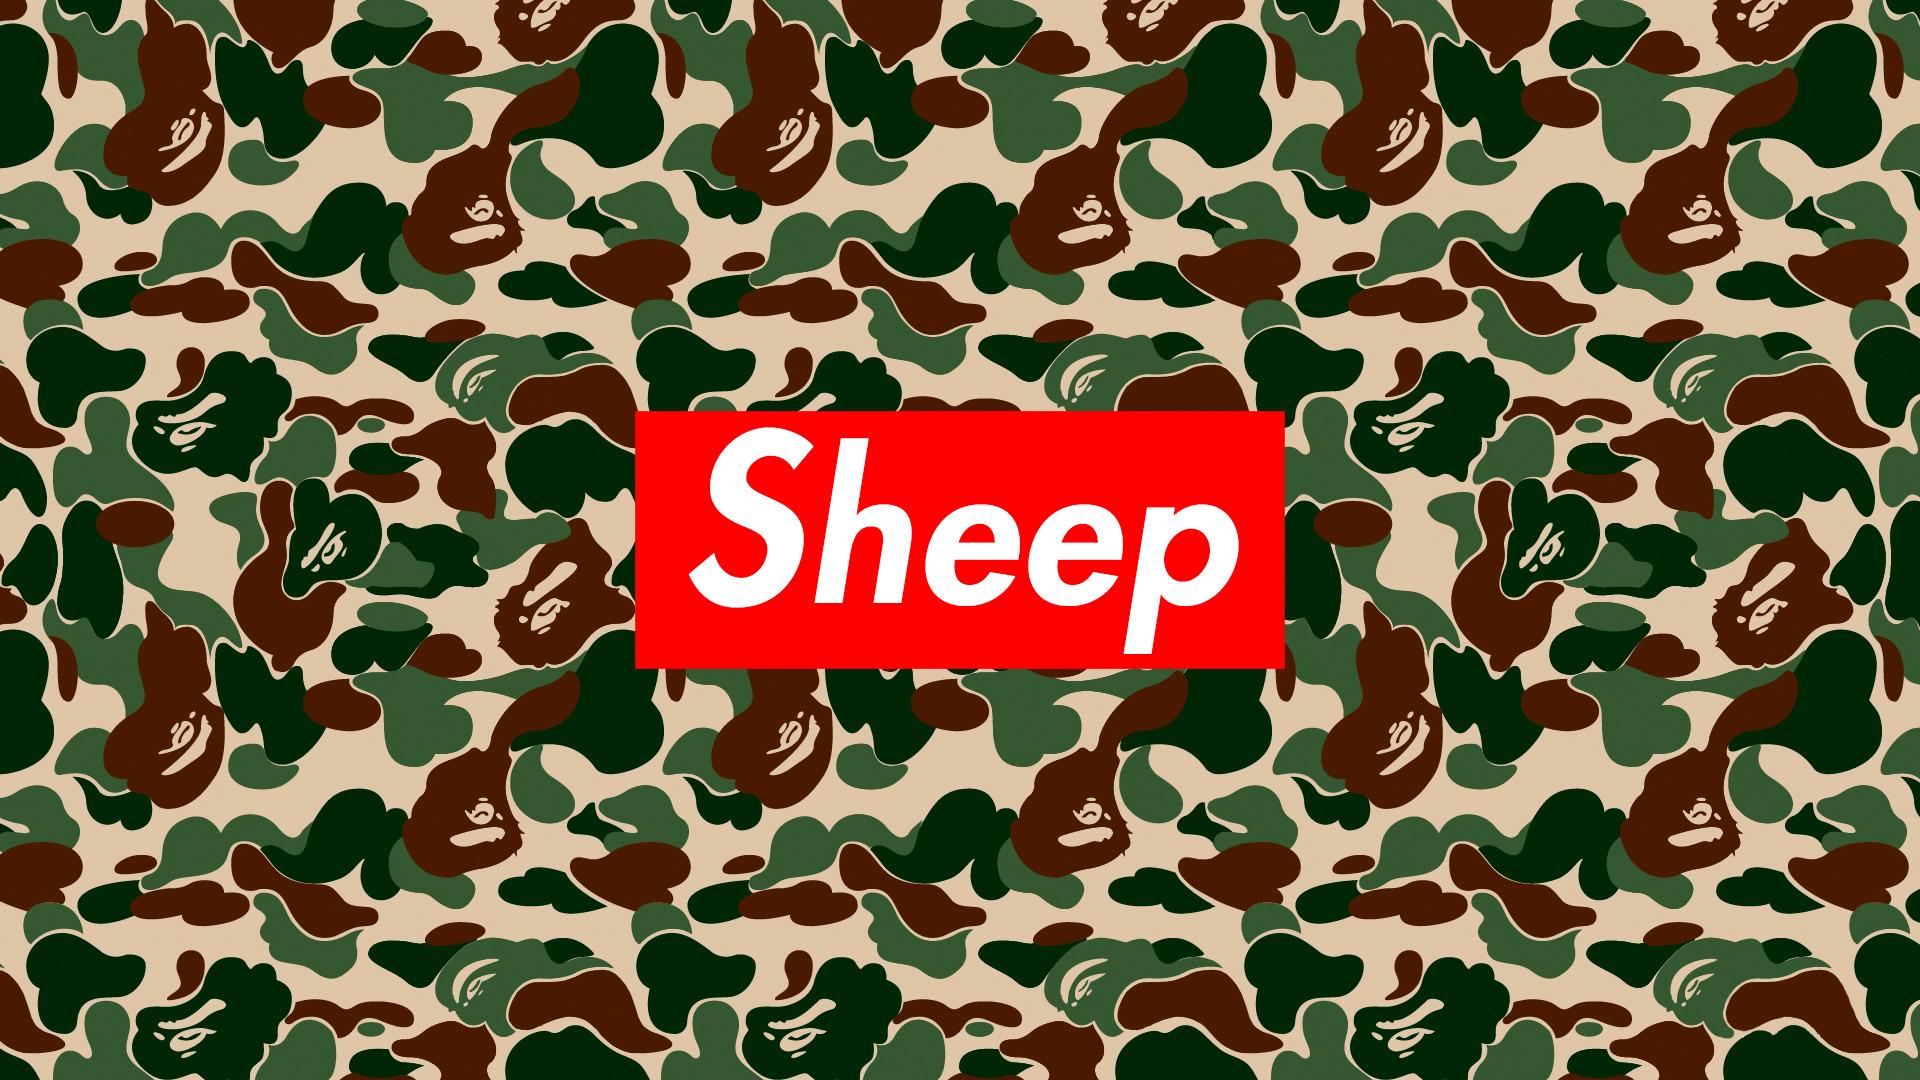 General 1920x1080 sheep humor red pattern